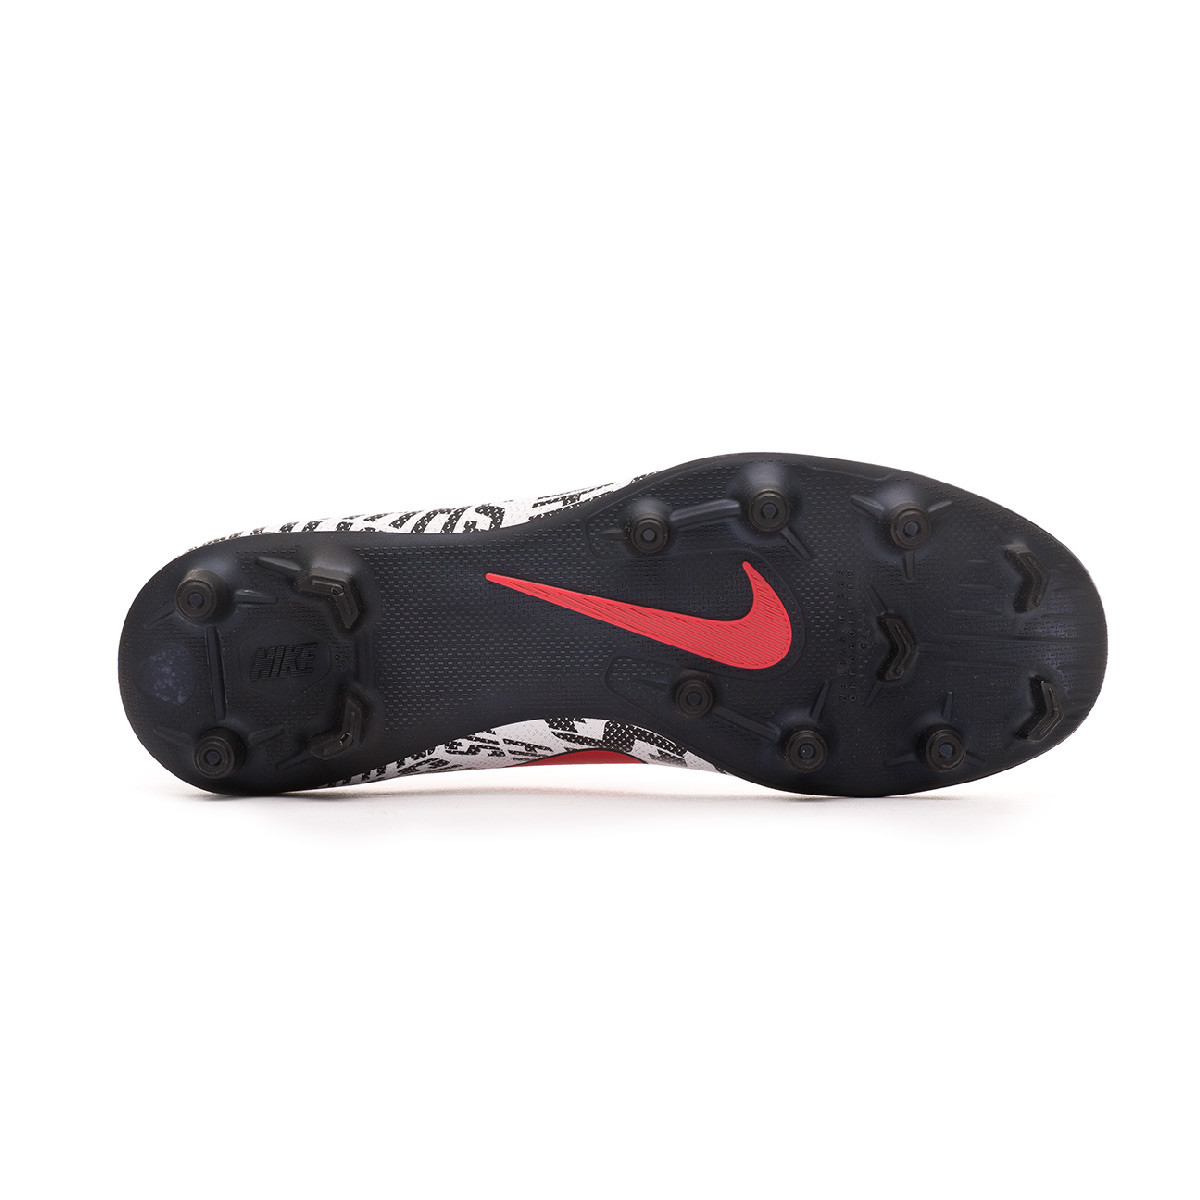 c9557af10fa Zapatos de fútbol Nike Mercurial Vapor XII Club Neymar Jr MG  White-Challenge red-Black - Tienda de fútbol Fútbol Emotion